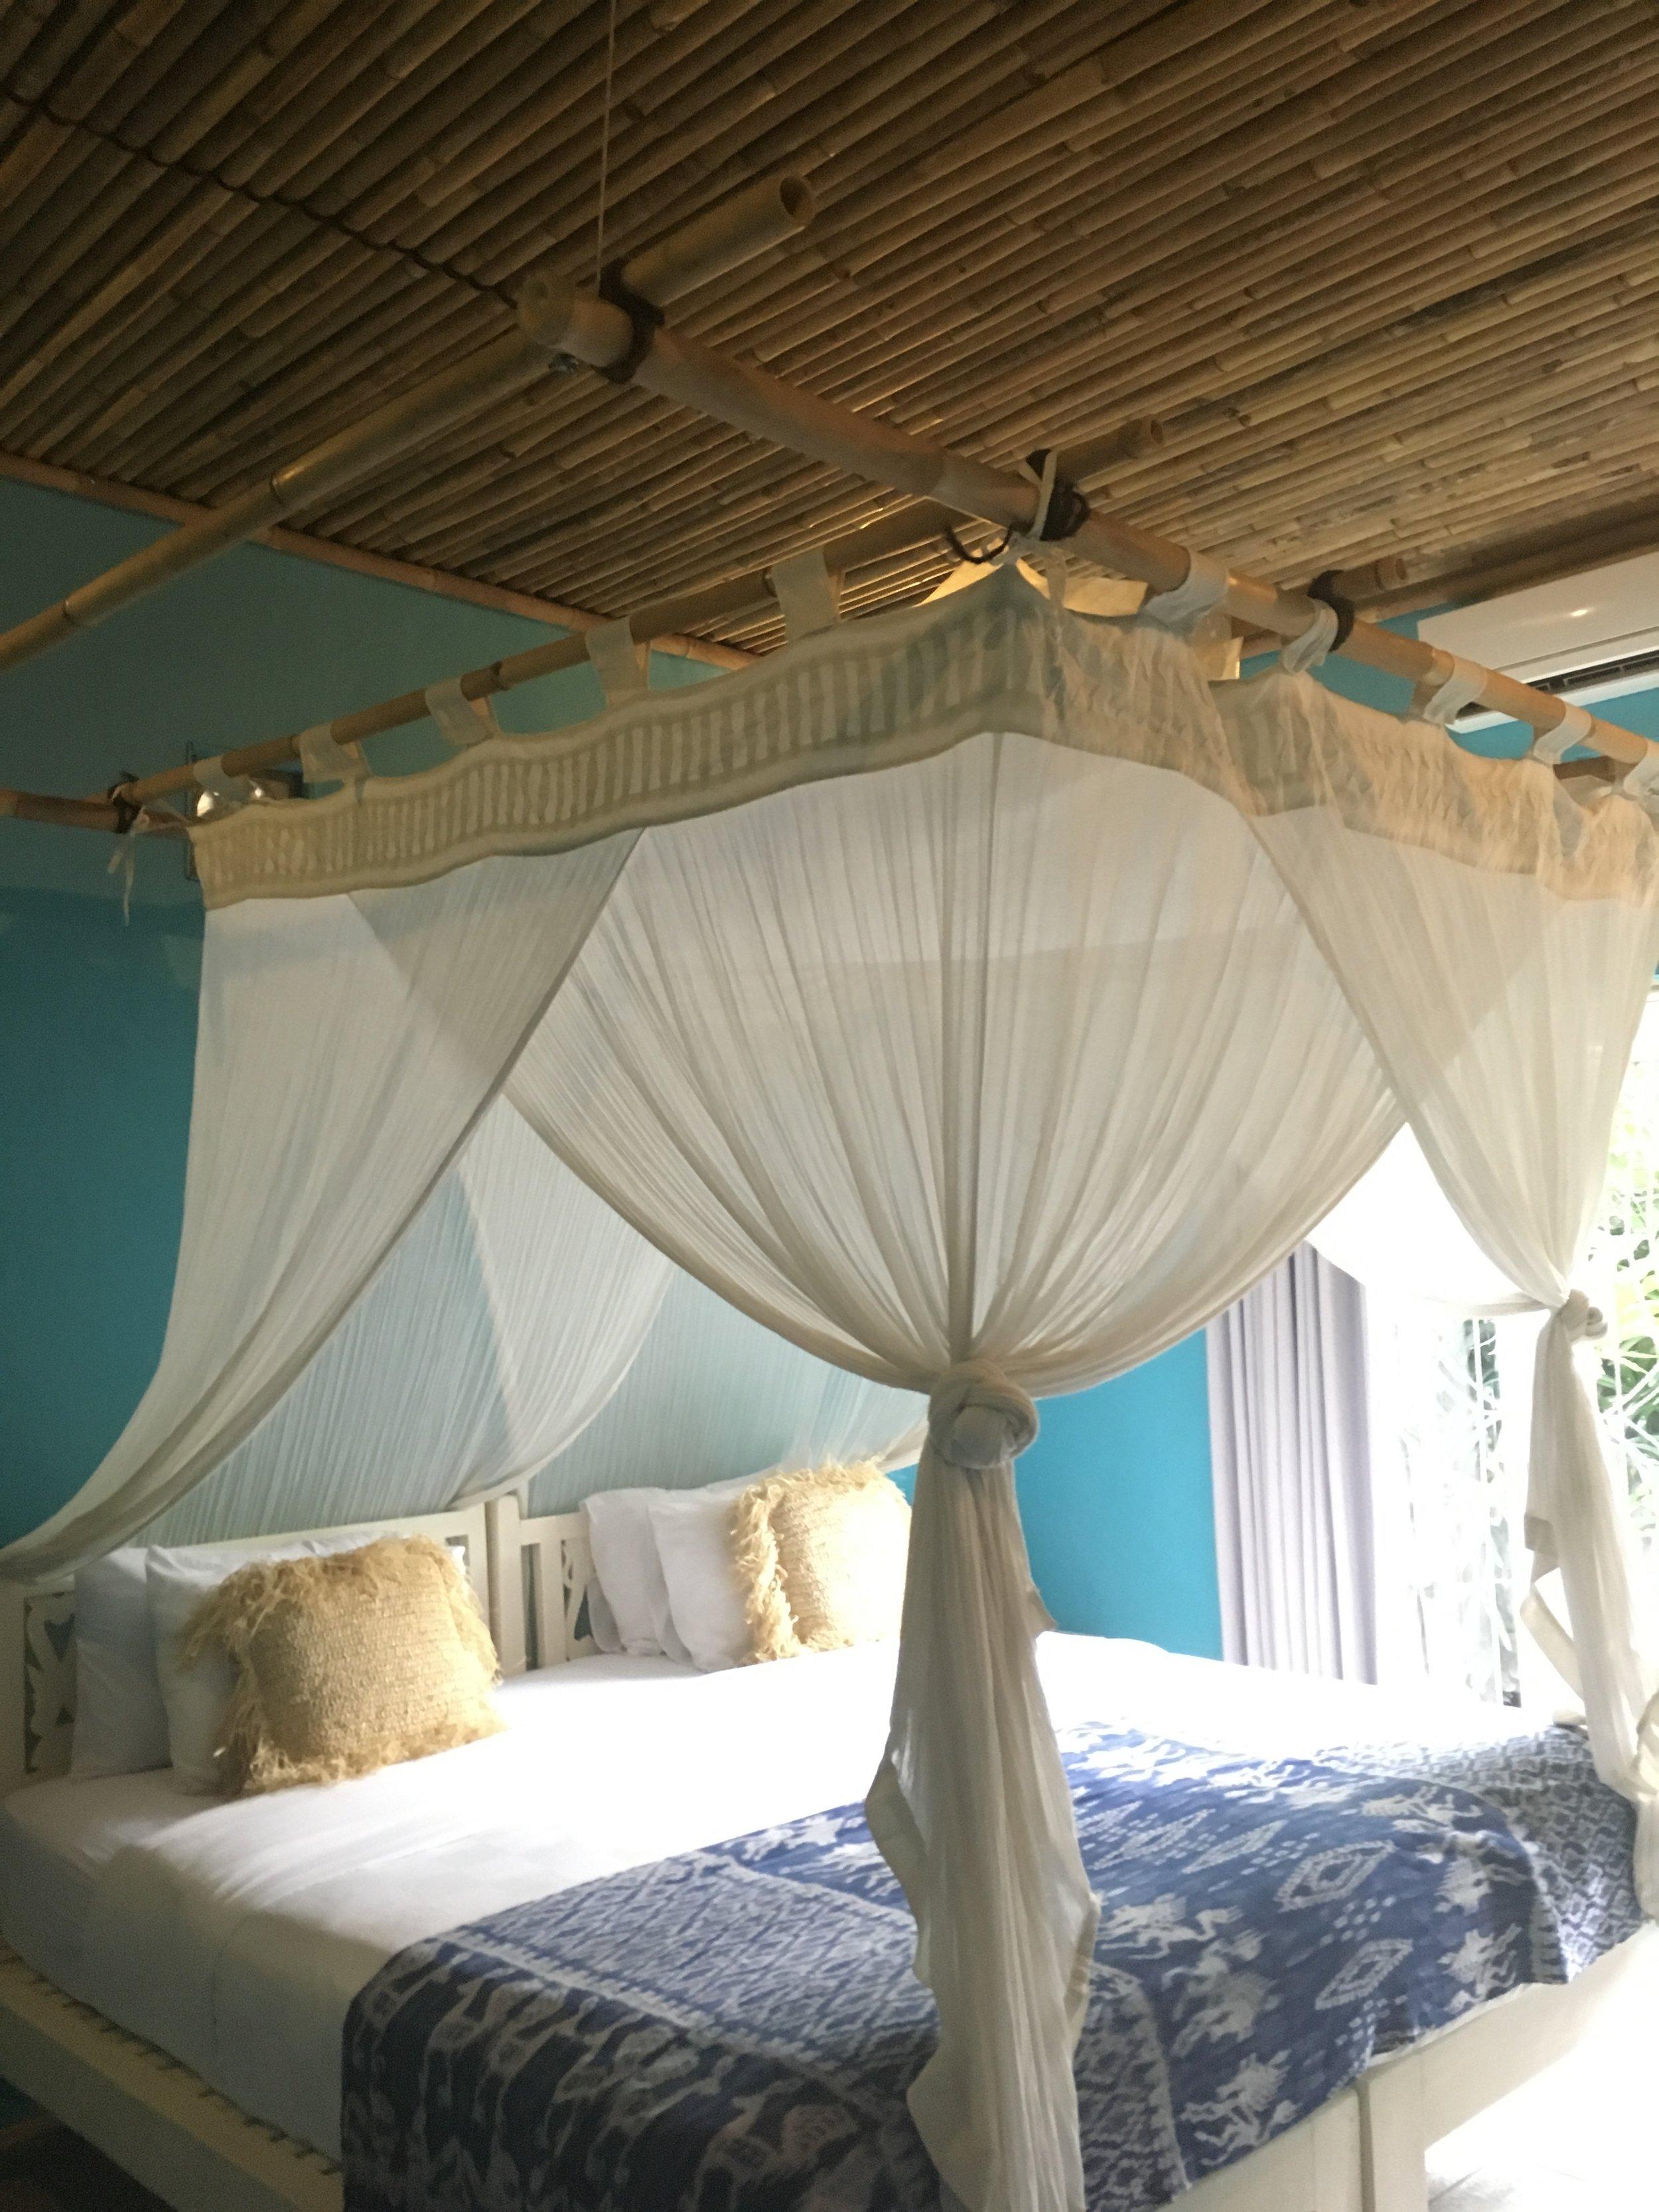 Beautiful and peaceful room